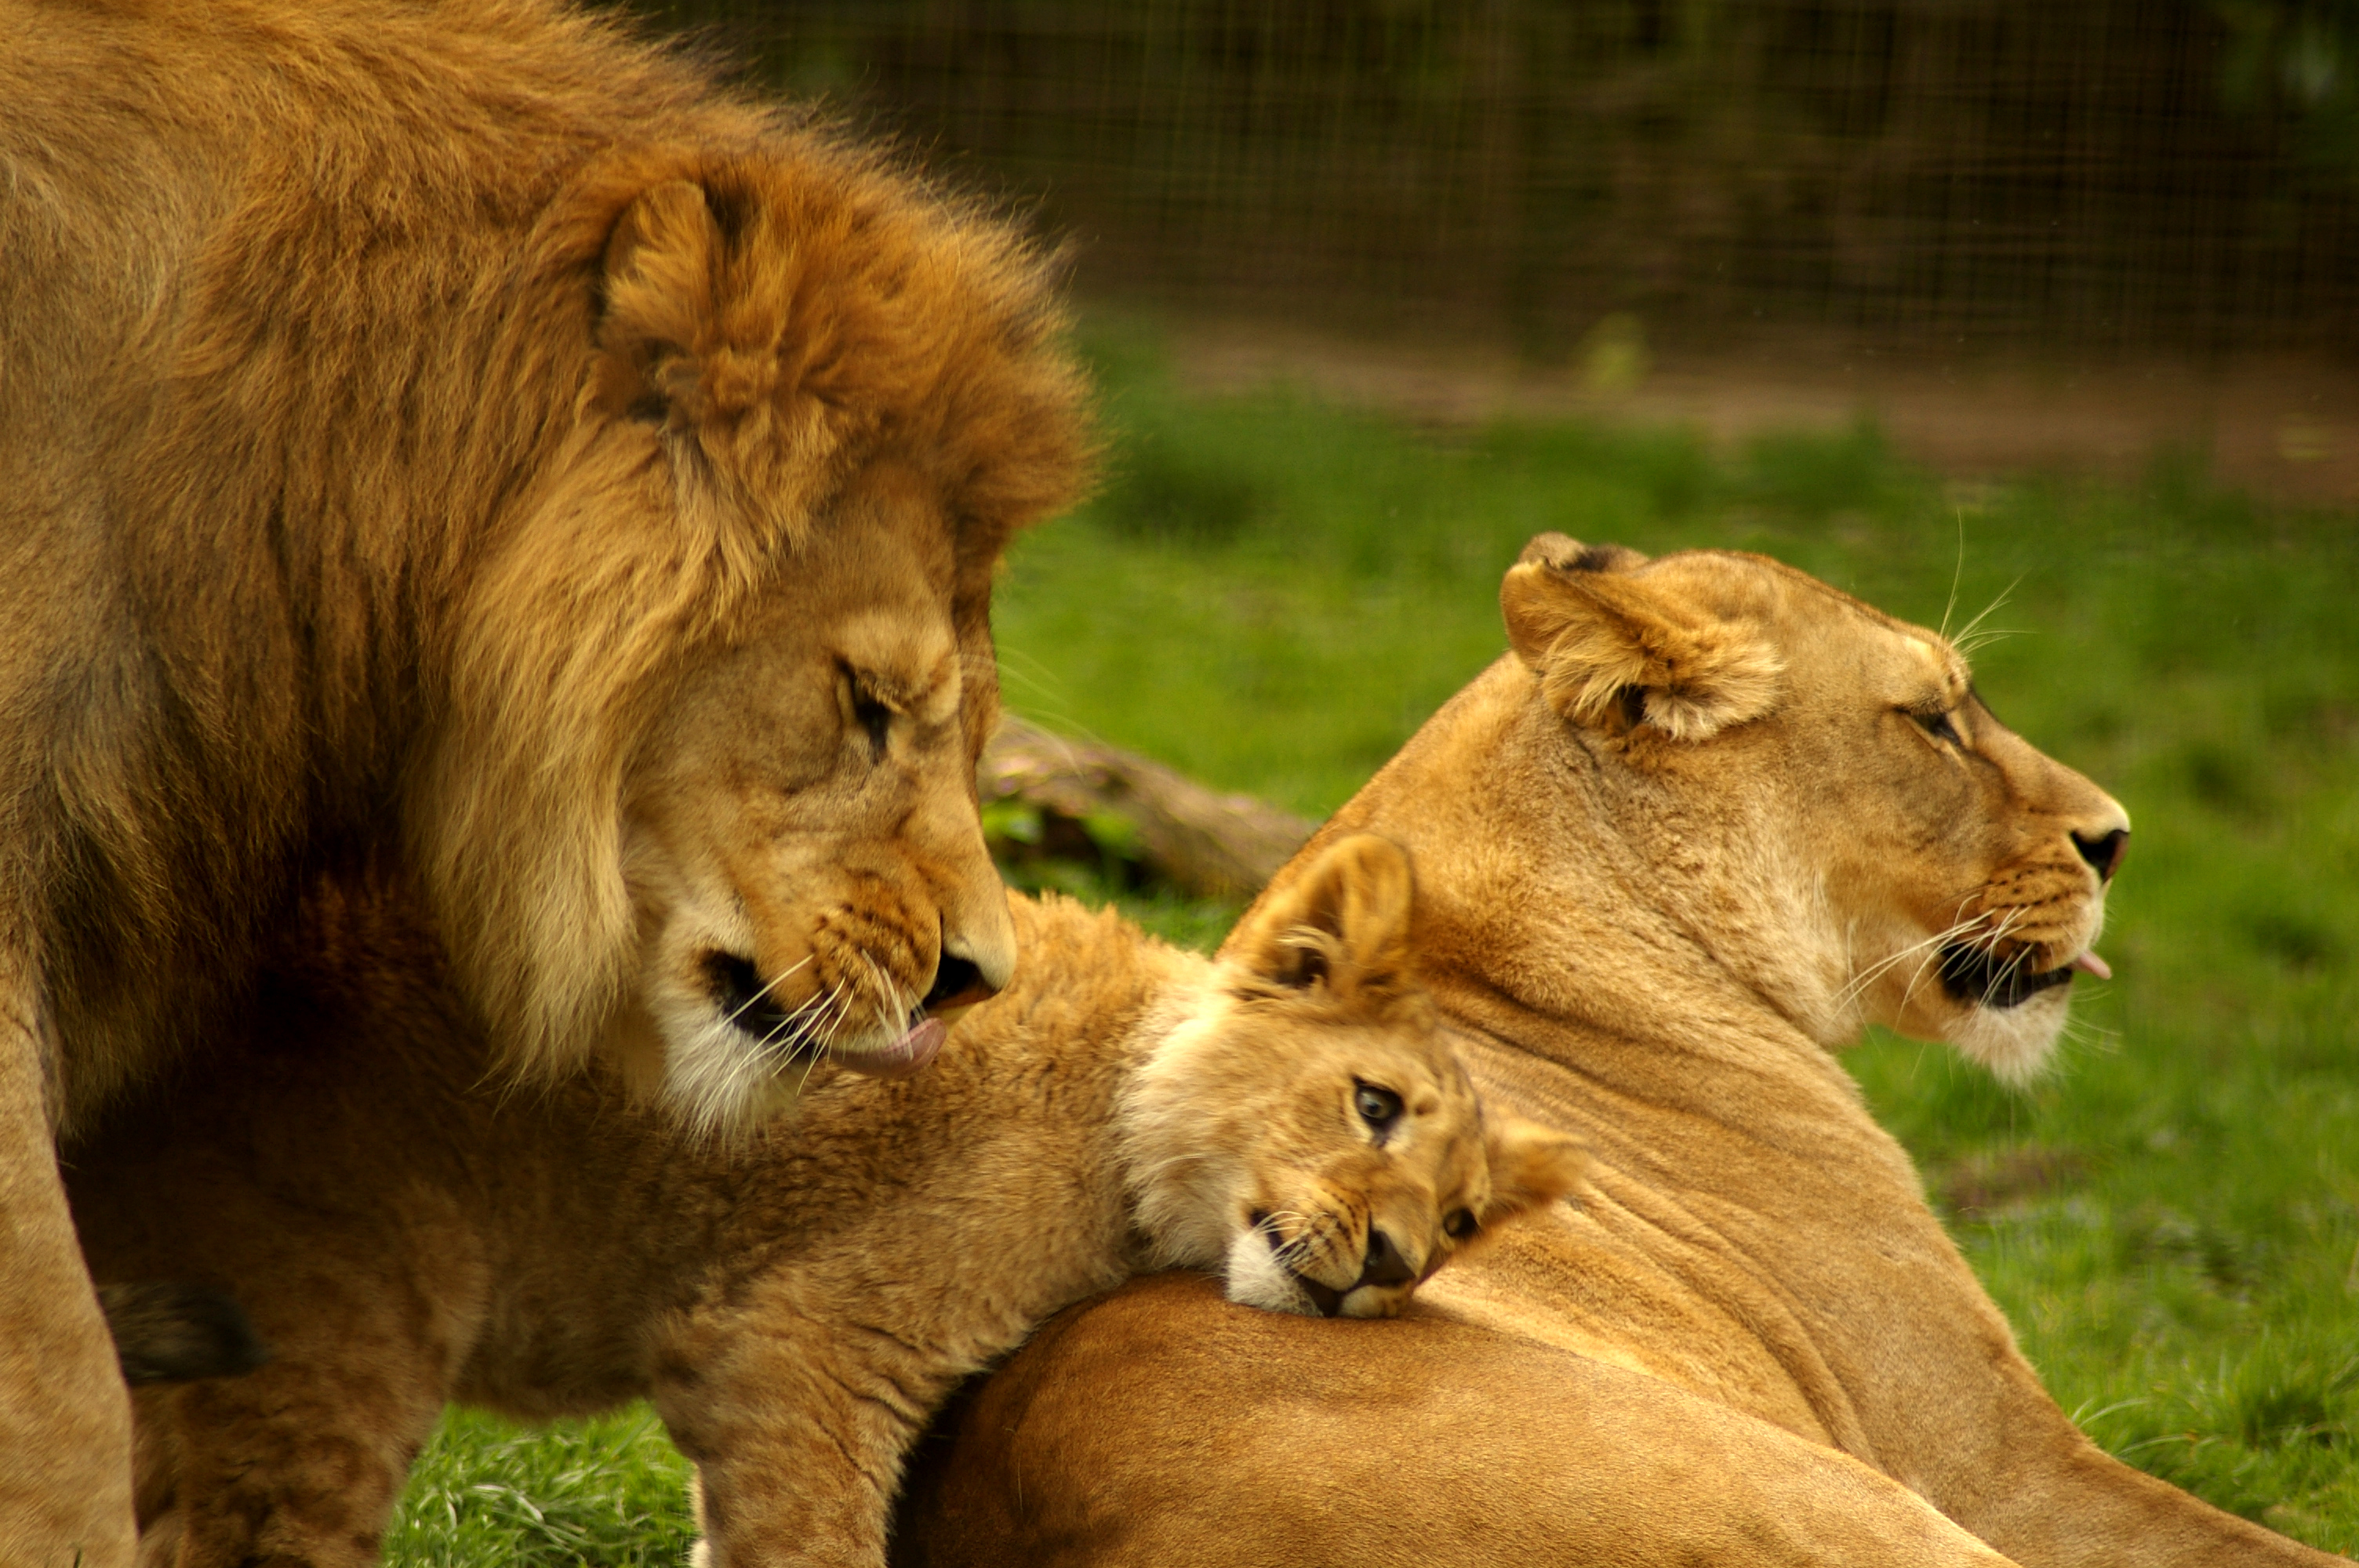 http://fc06.deviantart.net/fs26/f/2008/129/d/6/Lion_Family__by_TheSilverLotus.jpg